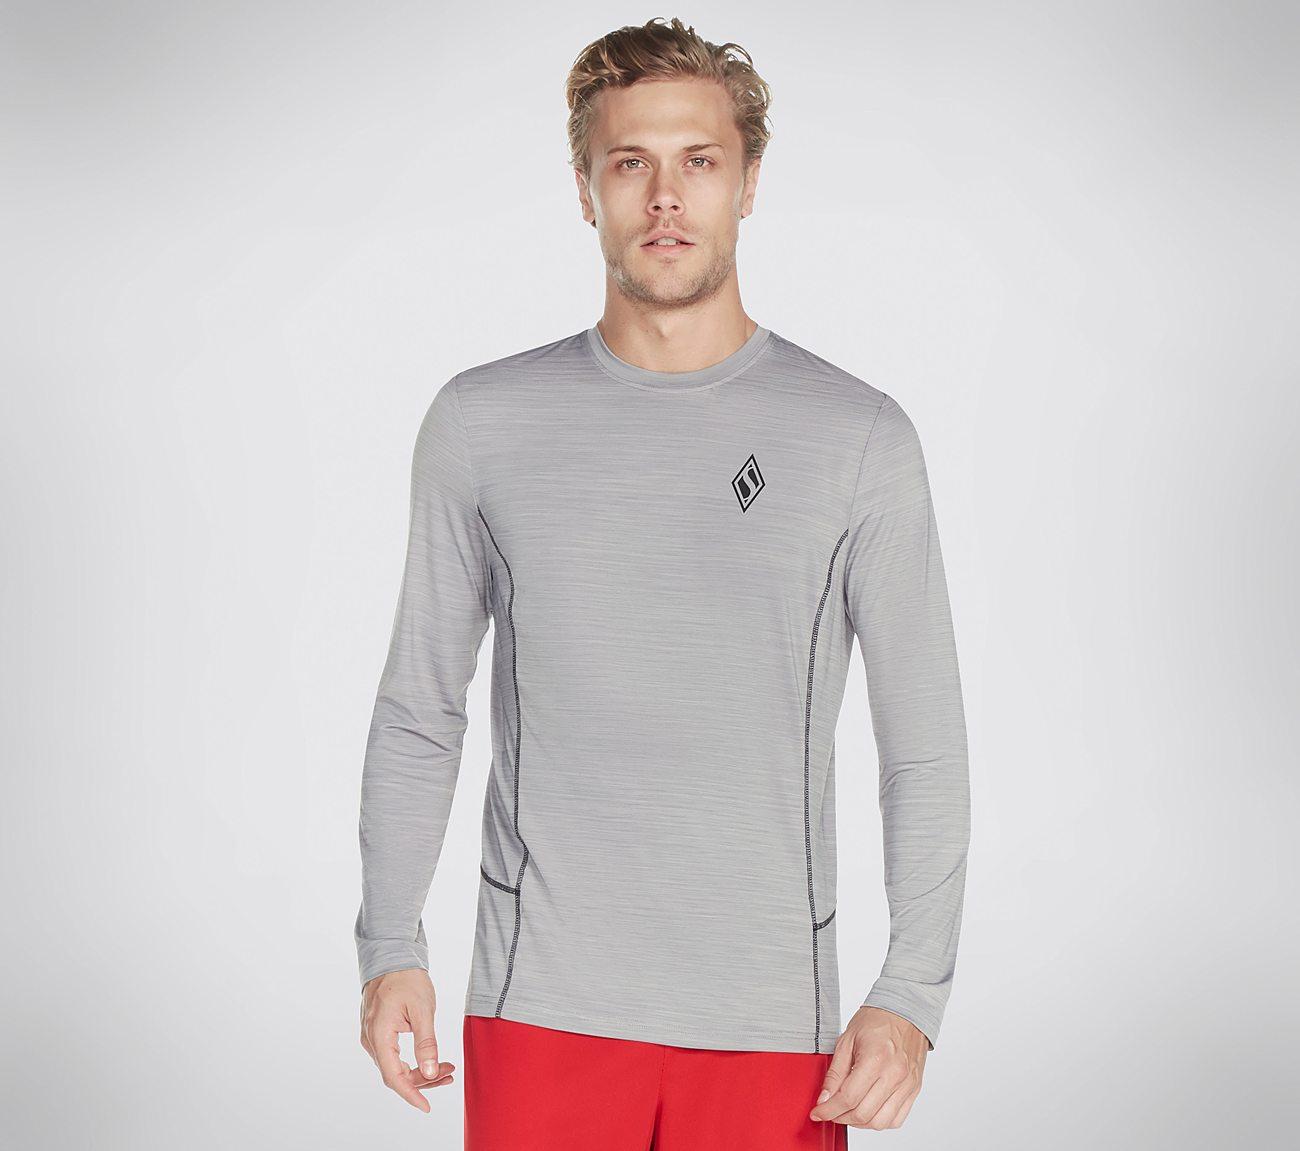 Skechers Apparel Altitude LS Tech Tee Shirt